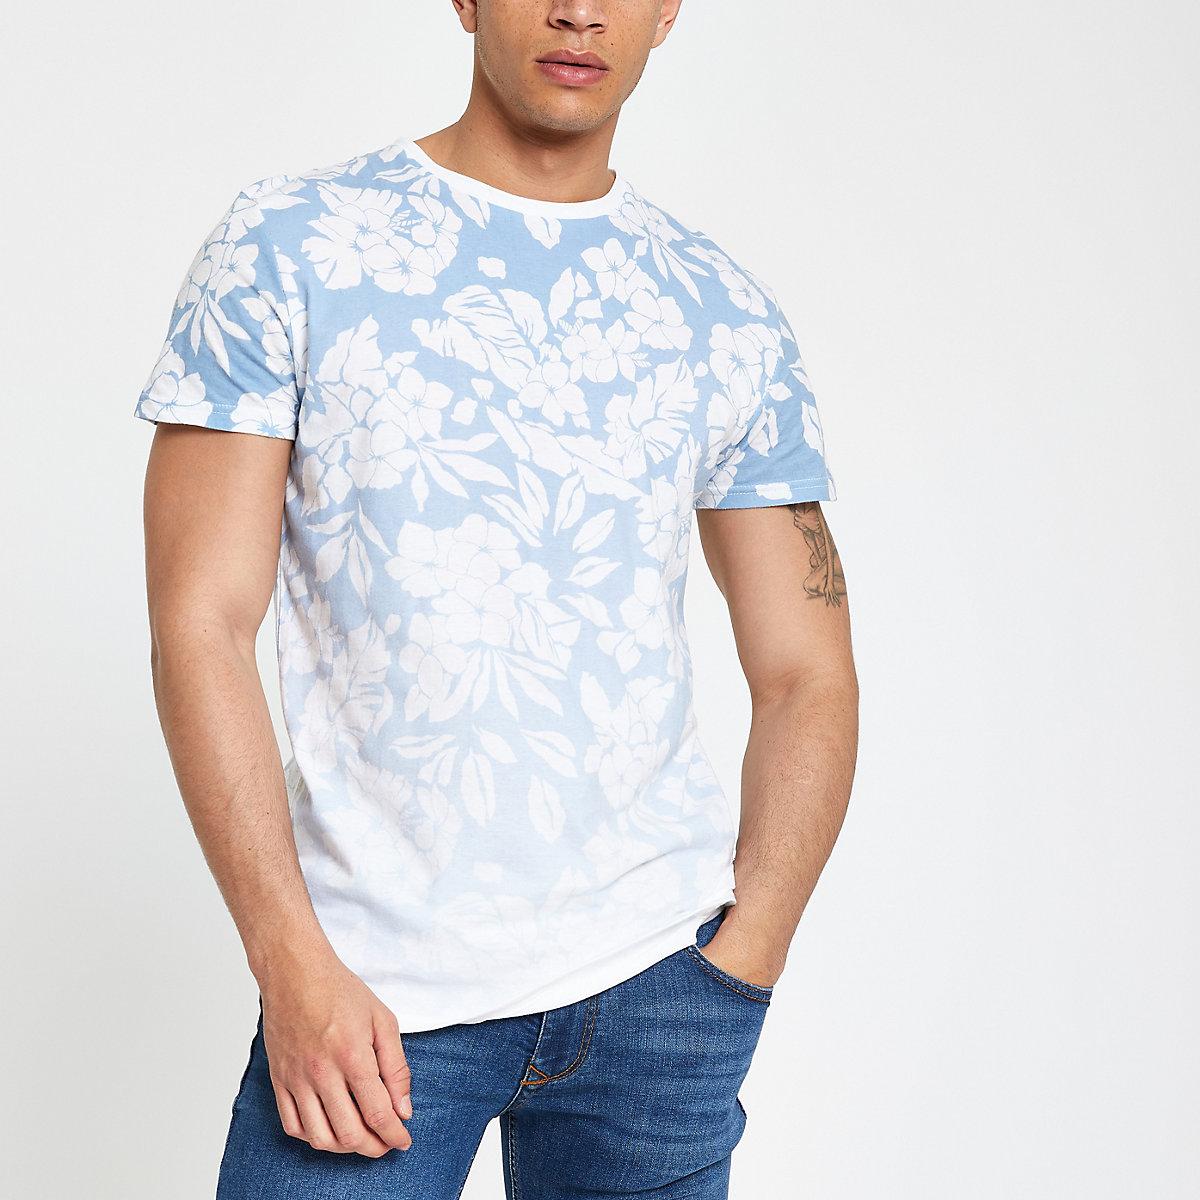 Bellfield blue ombre floral print T-shirt